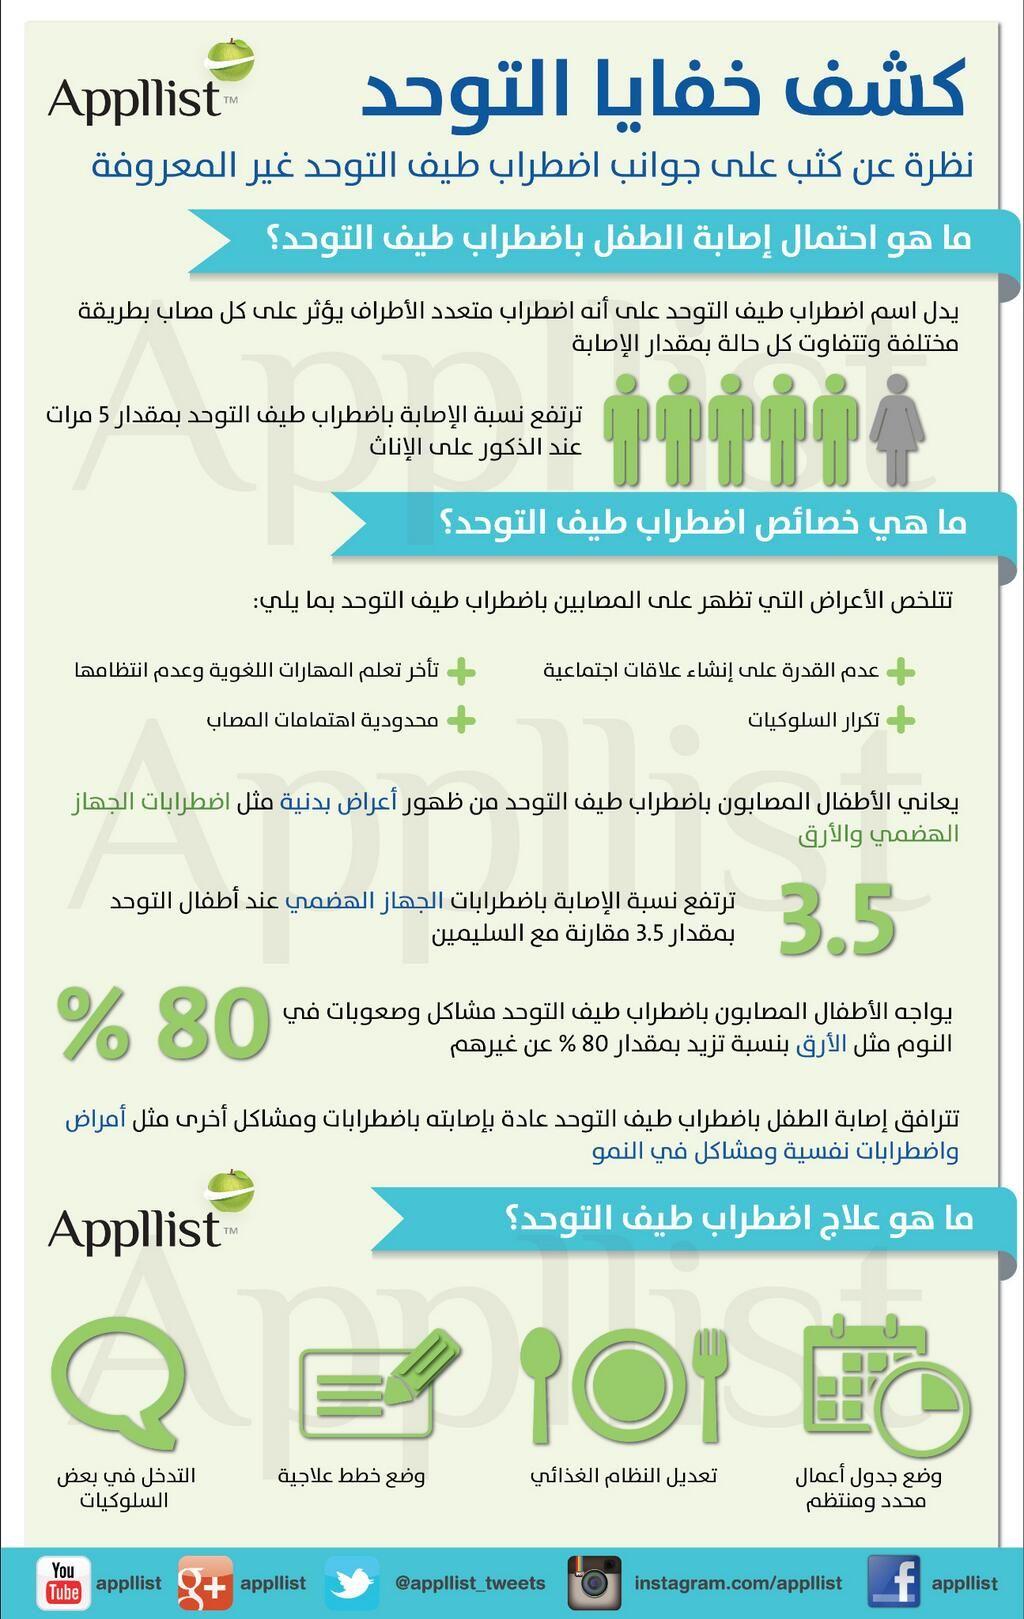 ابليست بالعربية On Twitter Arabic Alphabet For Kids Childrens Education Emergency Medical